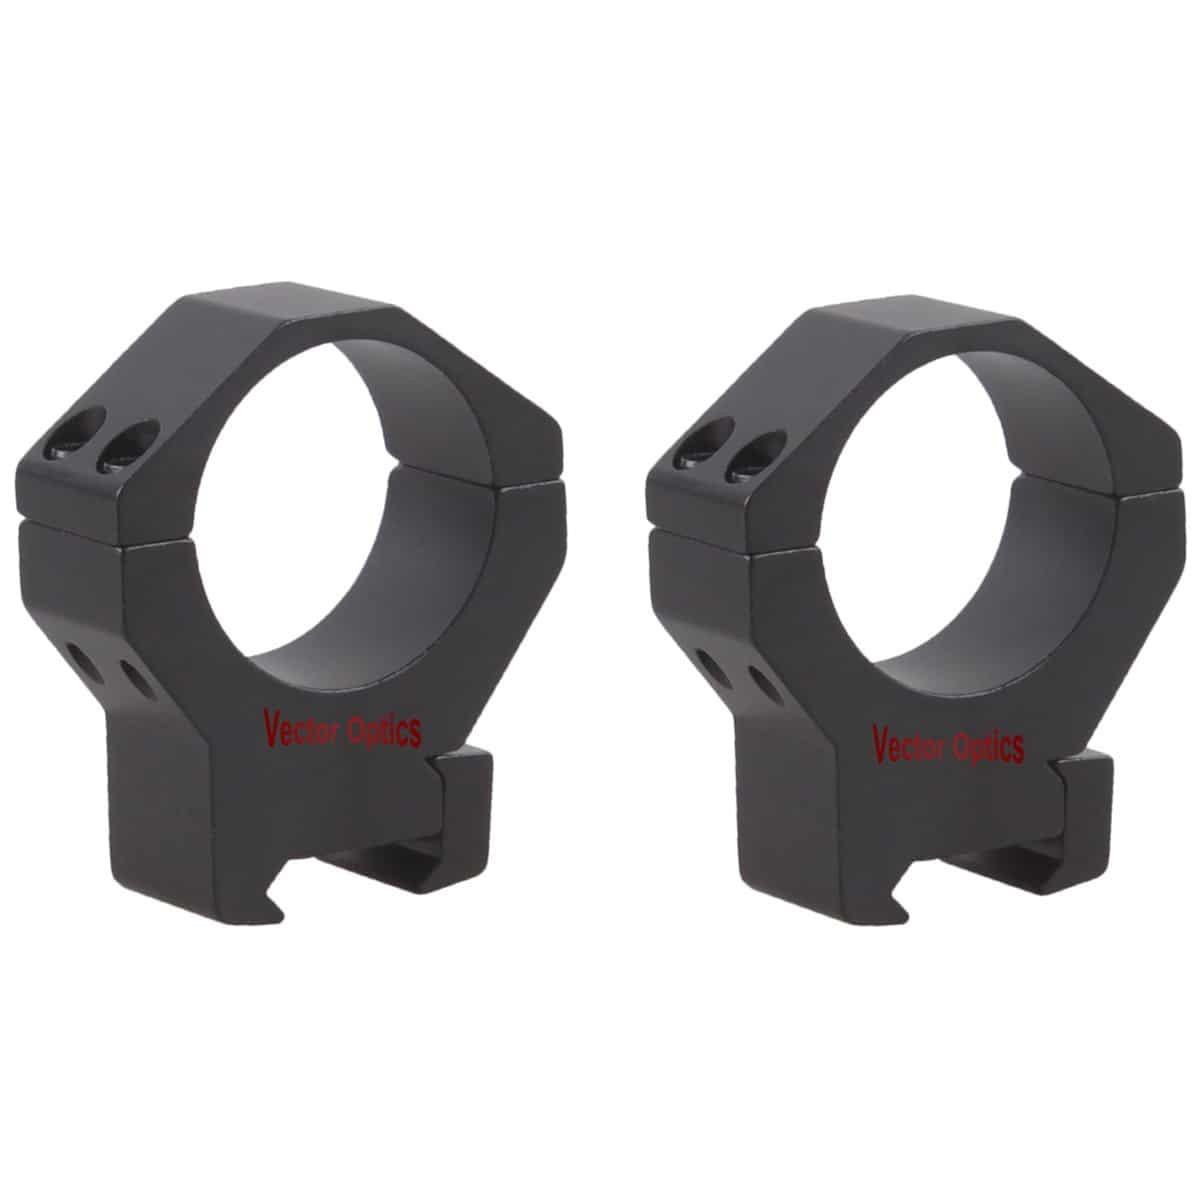 35mm Tactical Medium Picatinny Mount Rings